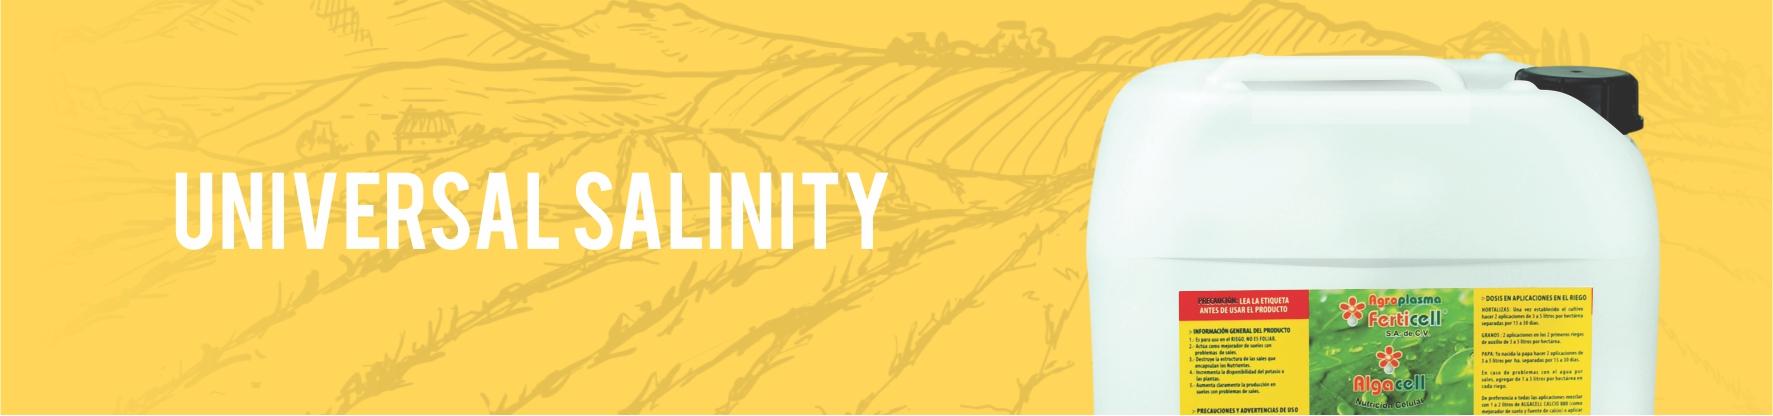 Universal Salinity